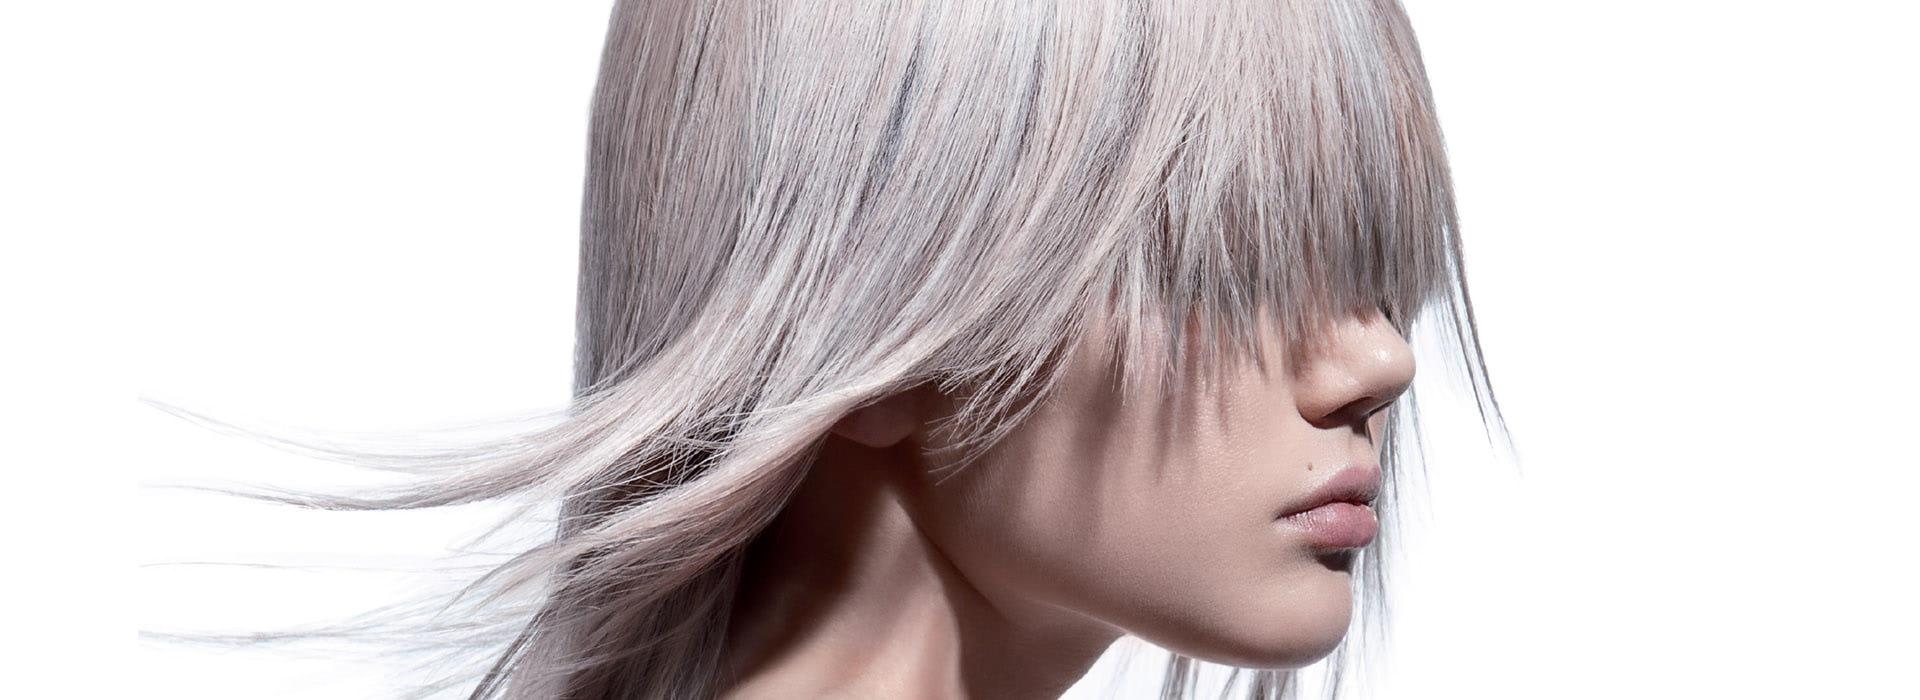 Hair Toth Lakme Akademia Step 1920 700 02